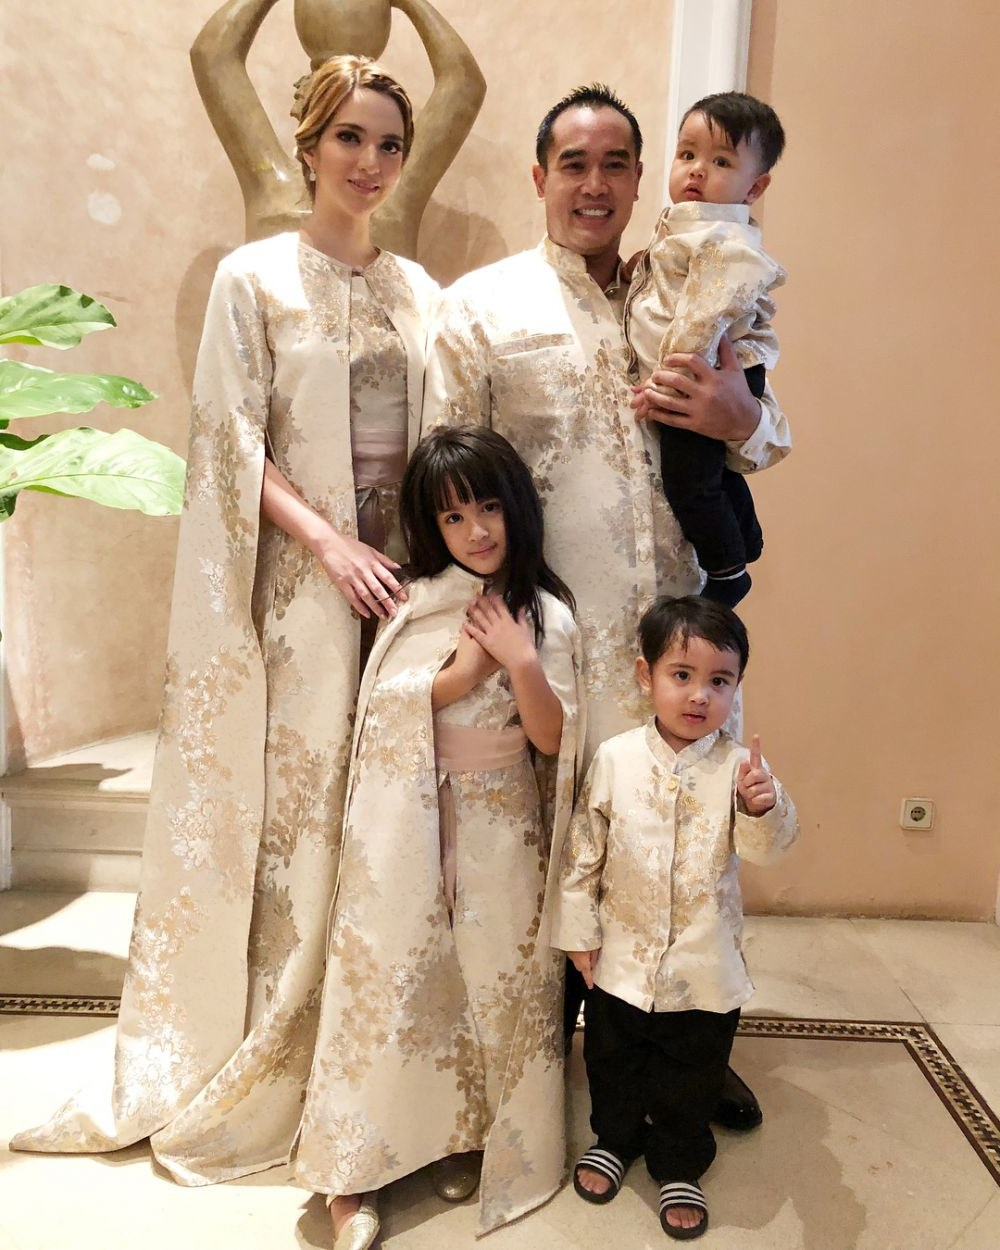 Bentuk Baju Lebaran Keluarga Warna Putih Drdp Potret 16 Seleb Pakai Baju Kembaran Saat Lebaran Kompak Abis